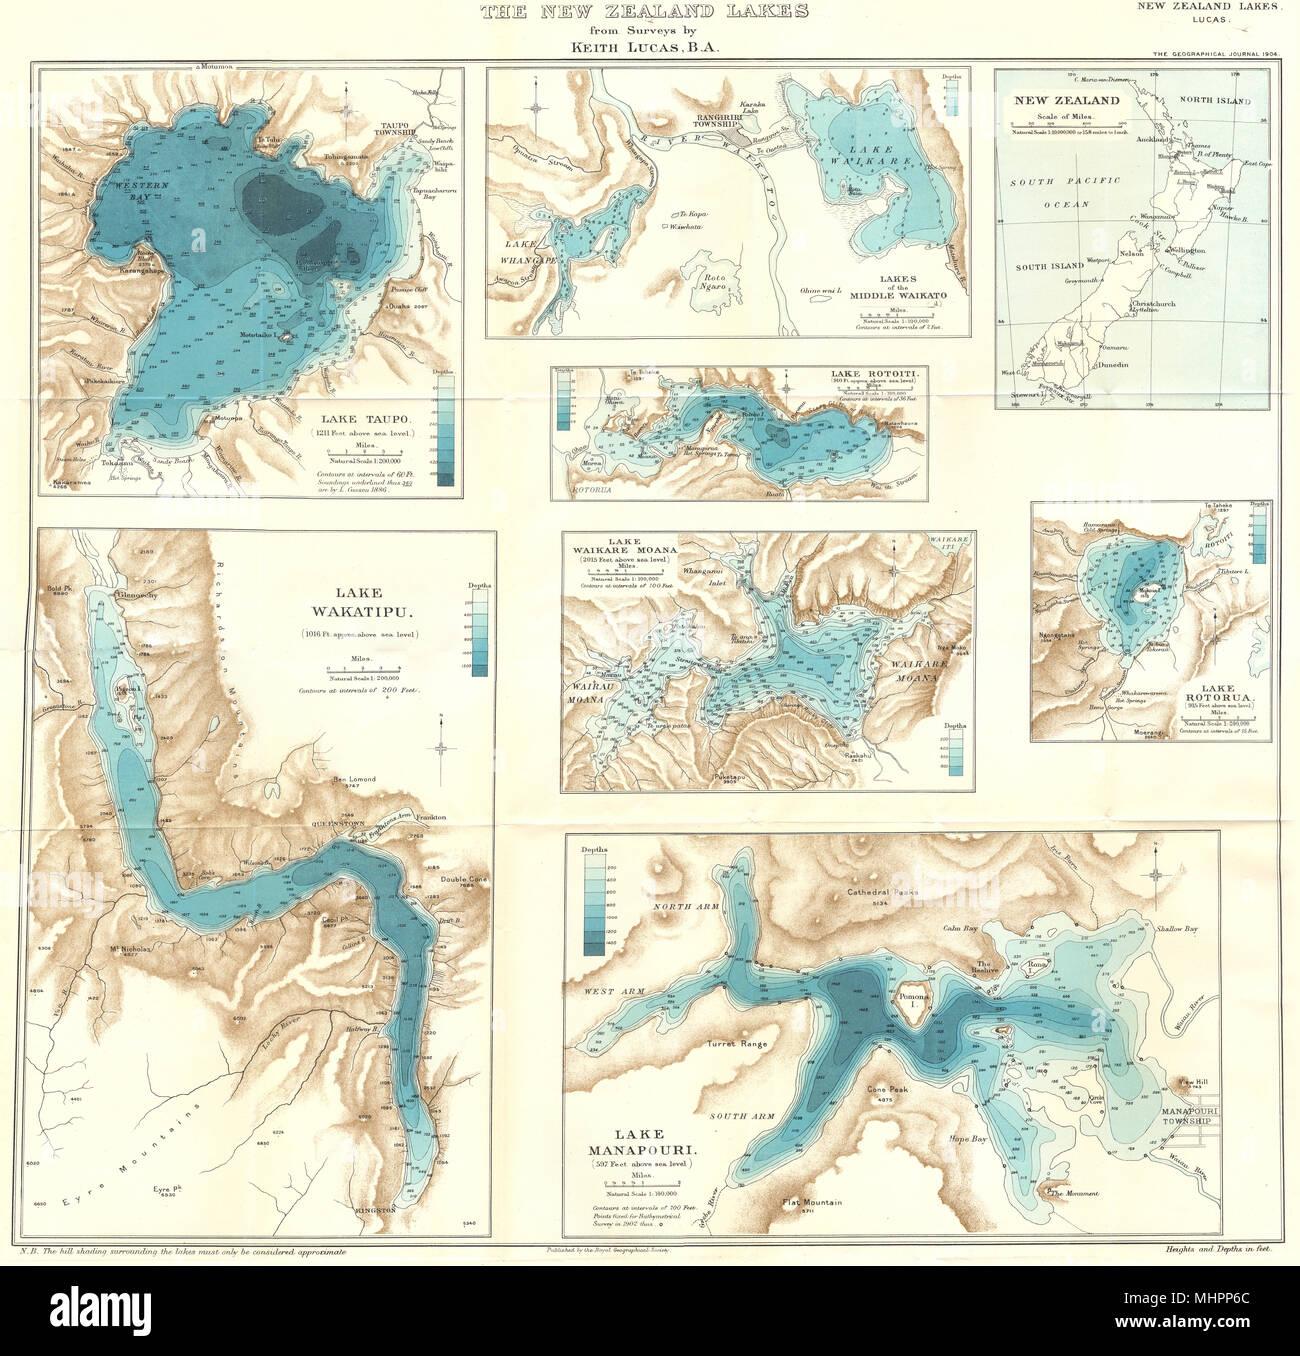 Map Of Rotorua New Zealand.New Zealand Lakes Taupo Waikato Rotoiti Wakatipu Waikare Moana